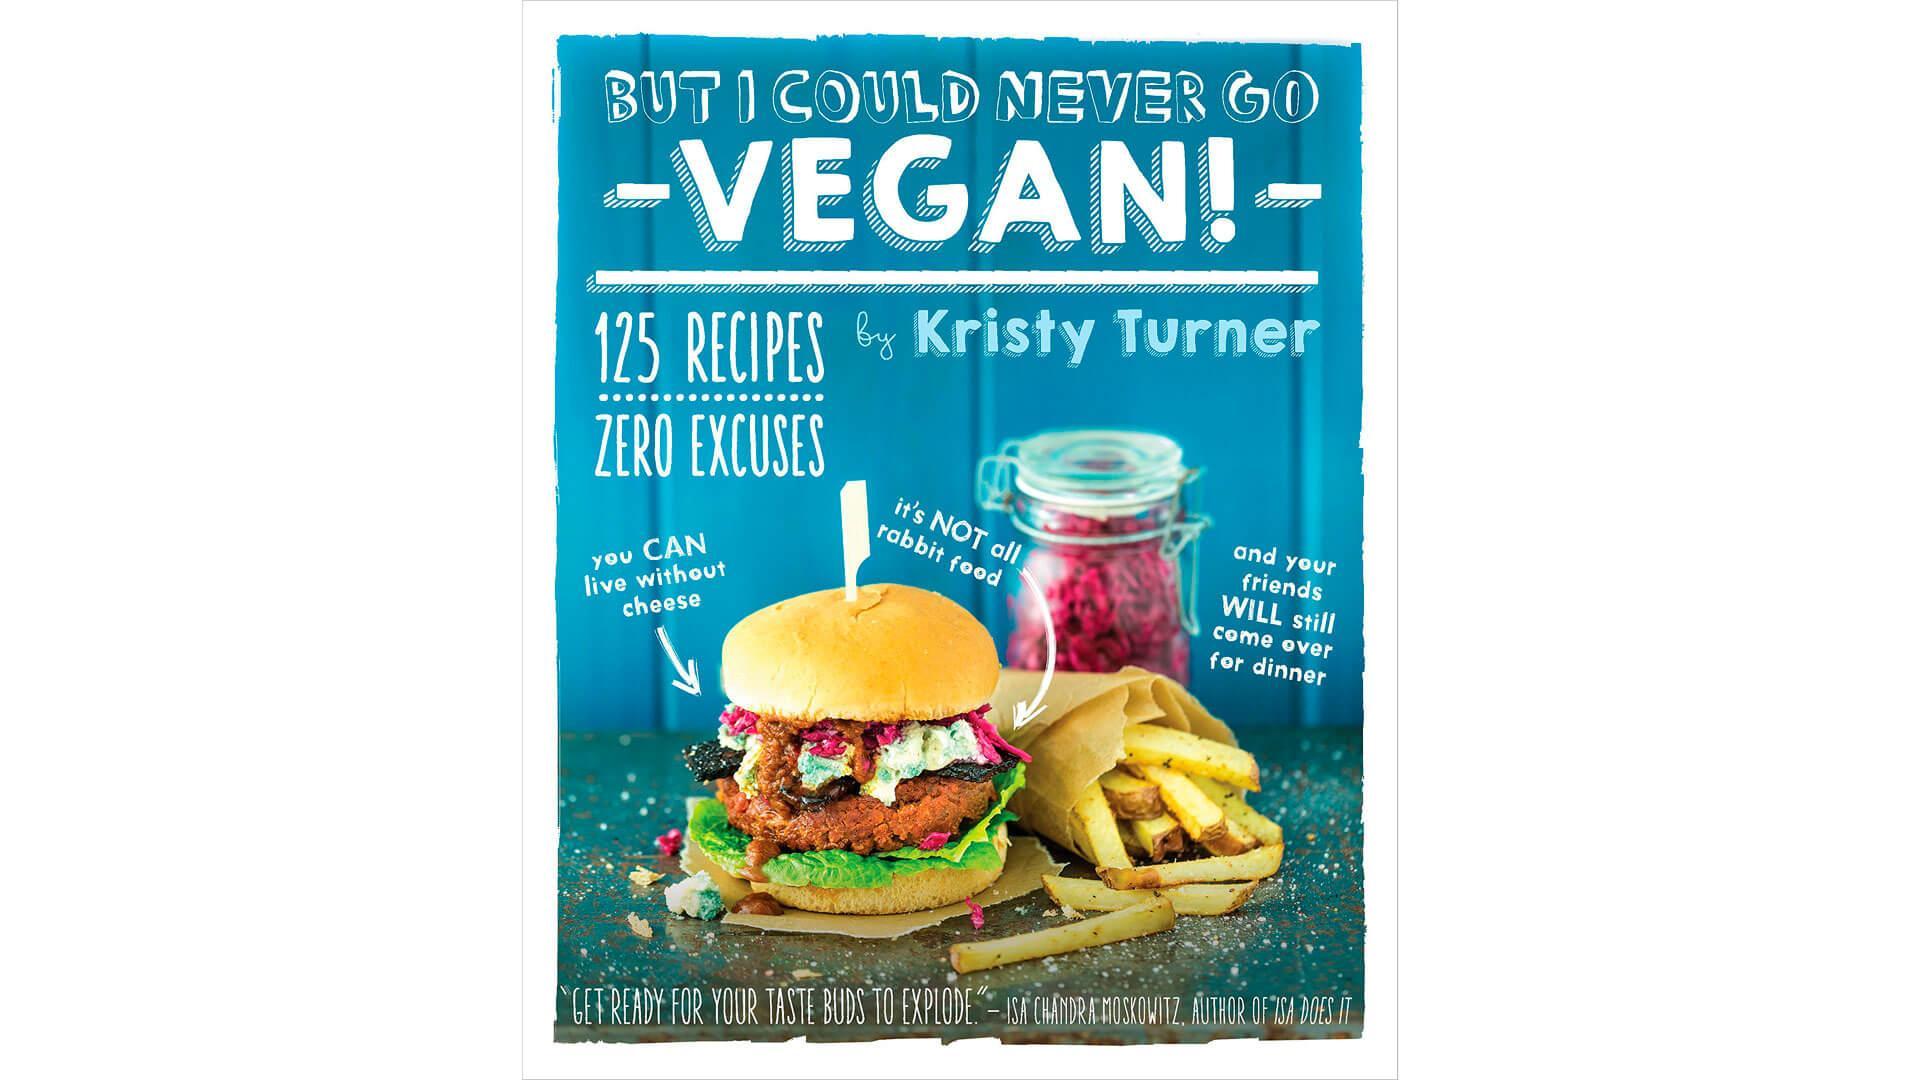 Vegan Cookbook: But I Could Never Go Vegan!